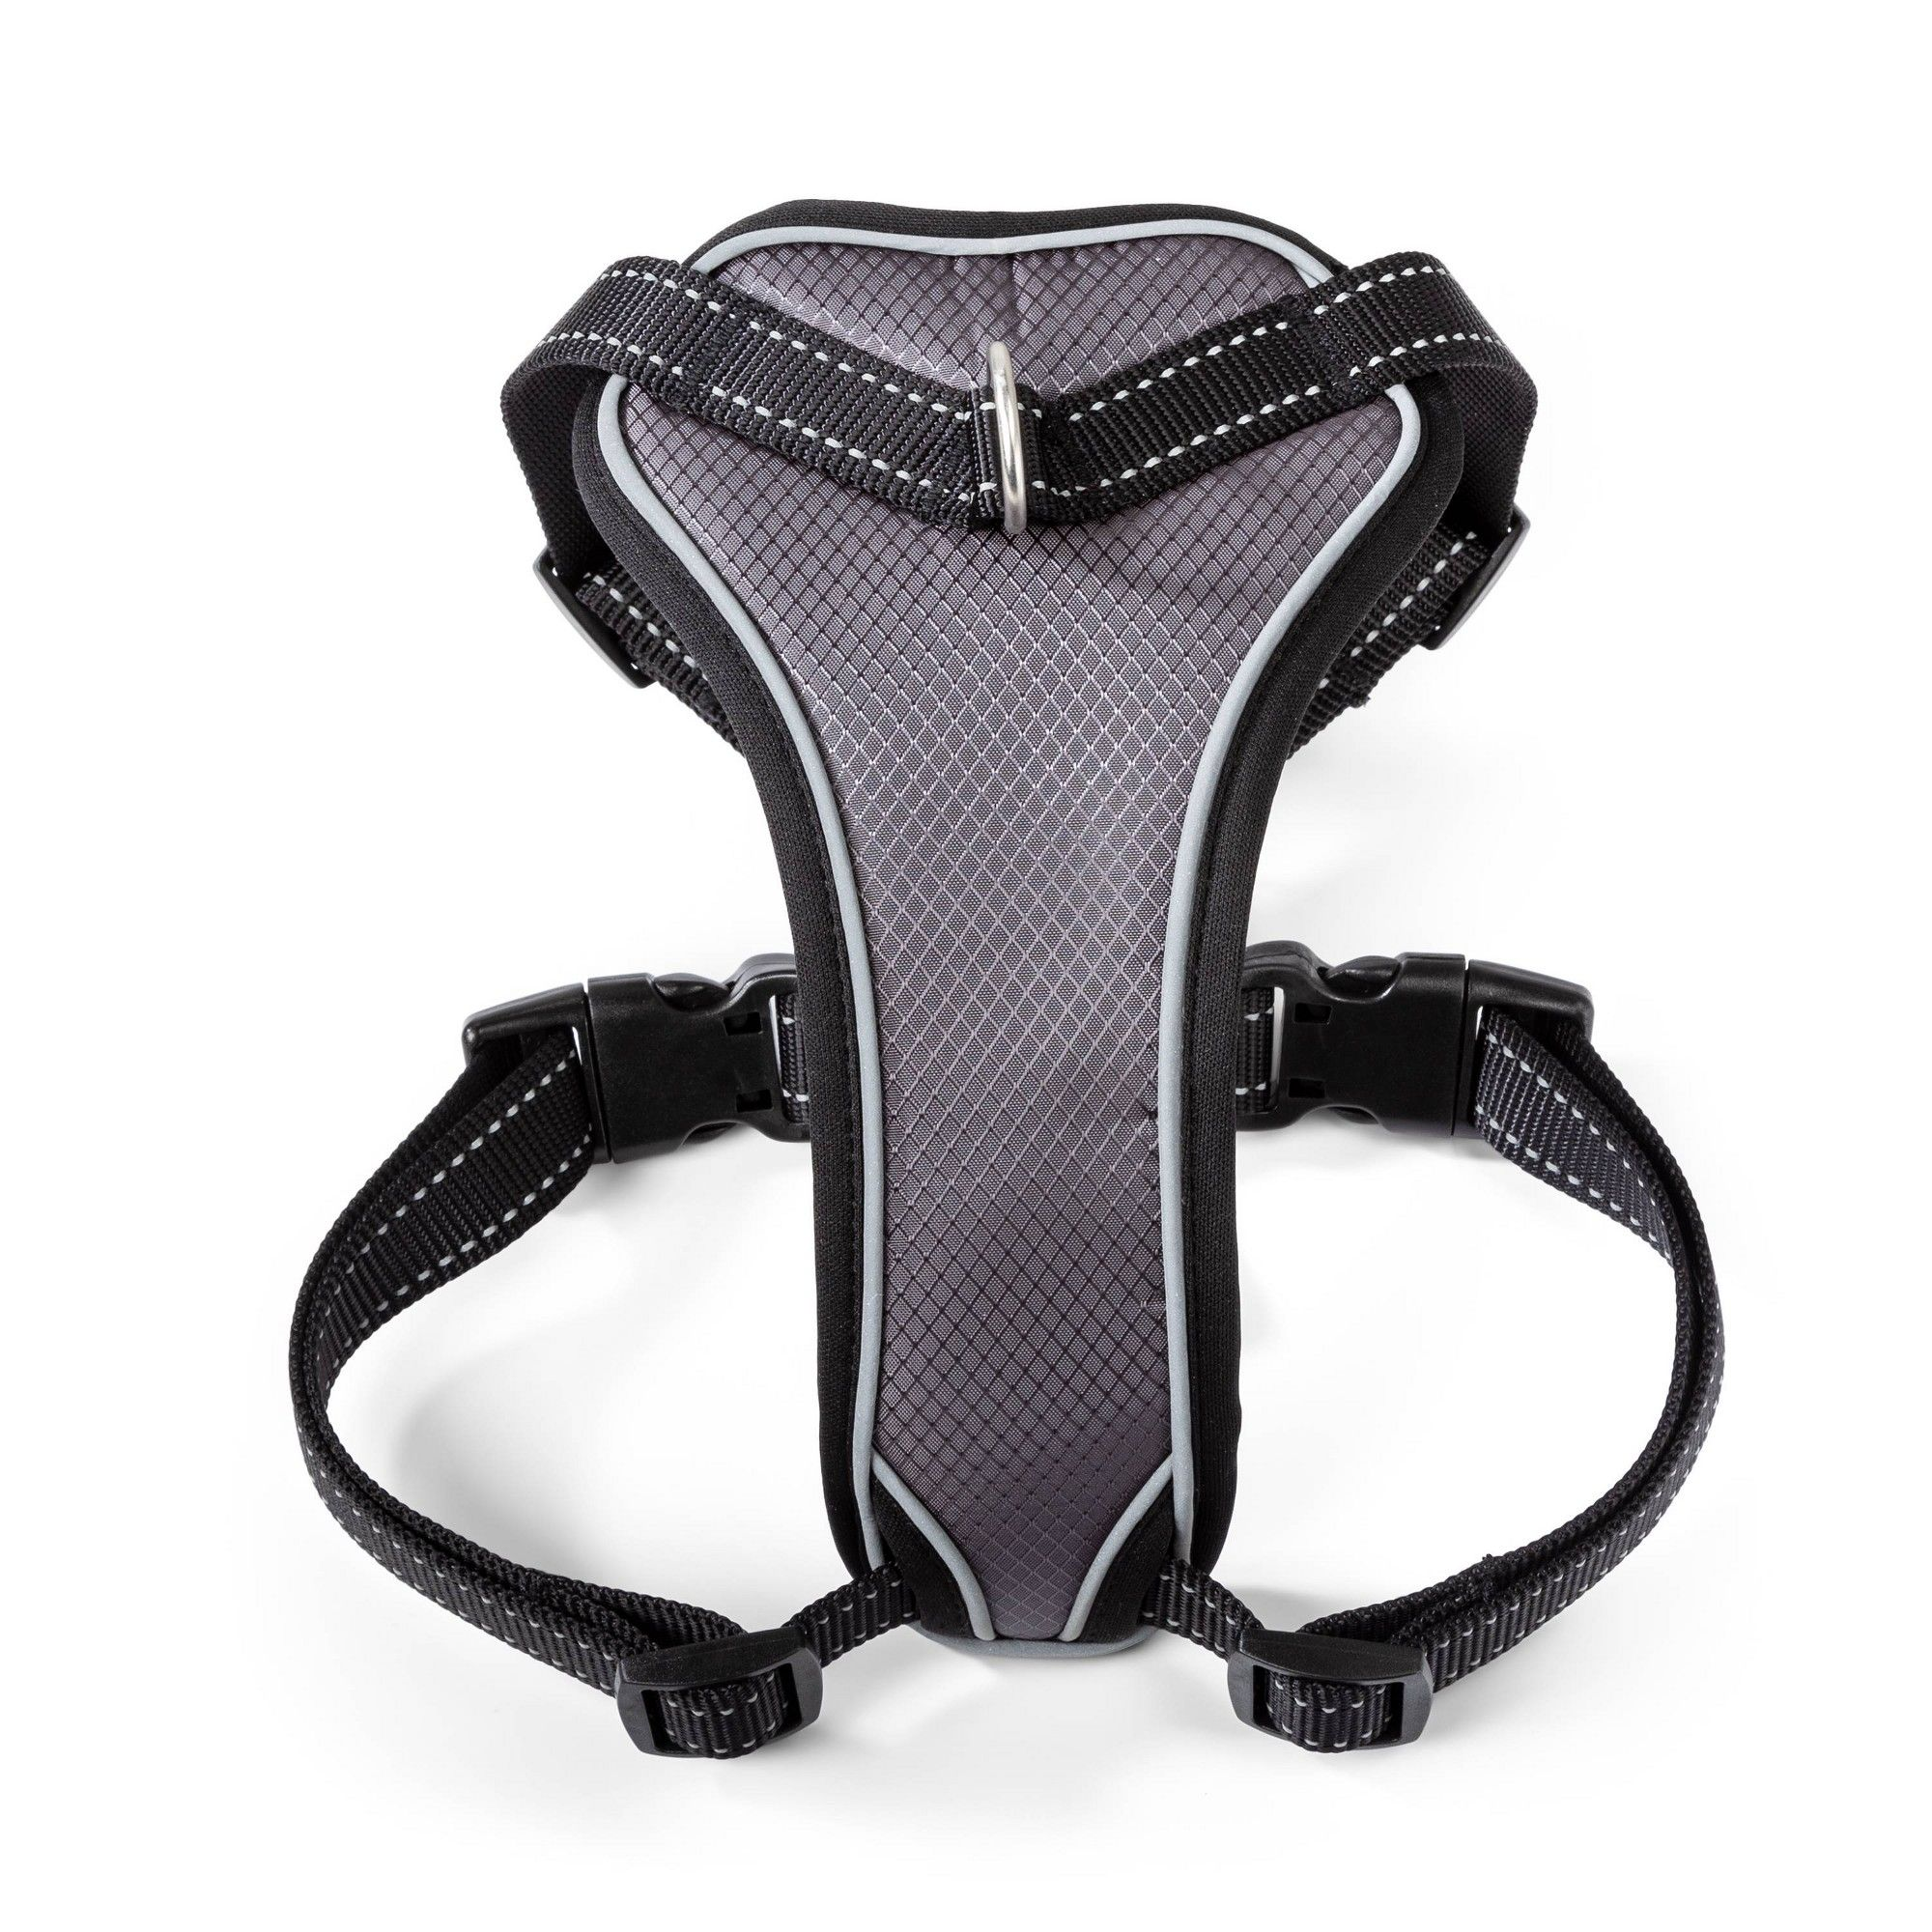 Ultimate Dog Harness Black Xs Boots Barkley Dog Harness